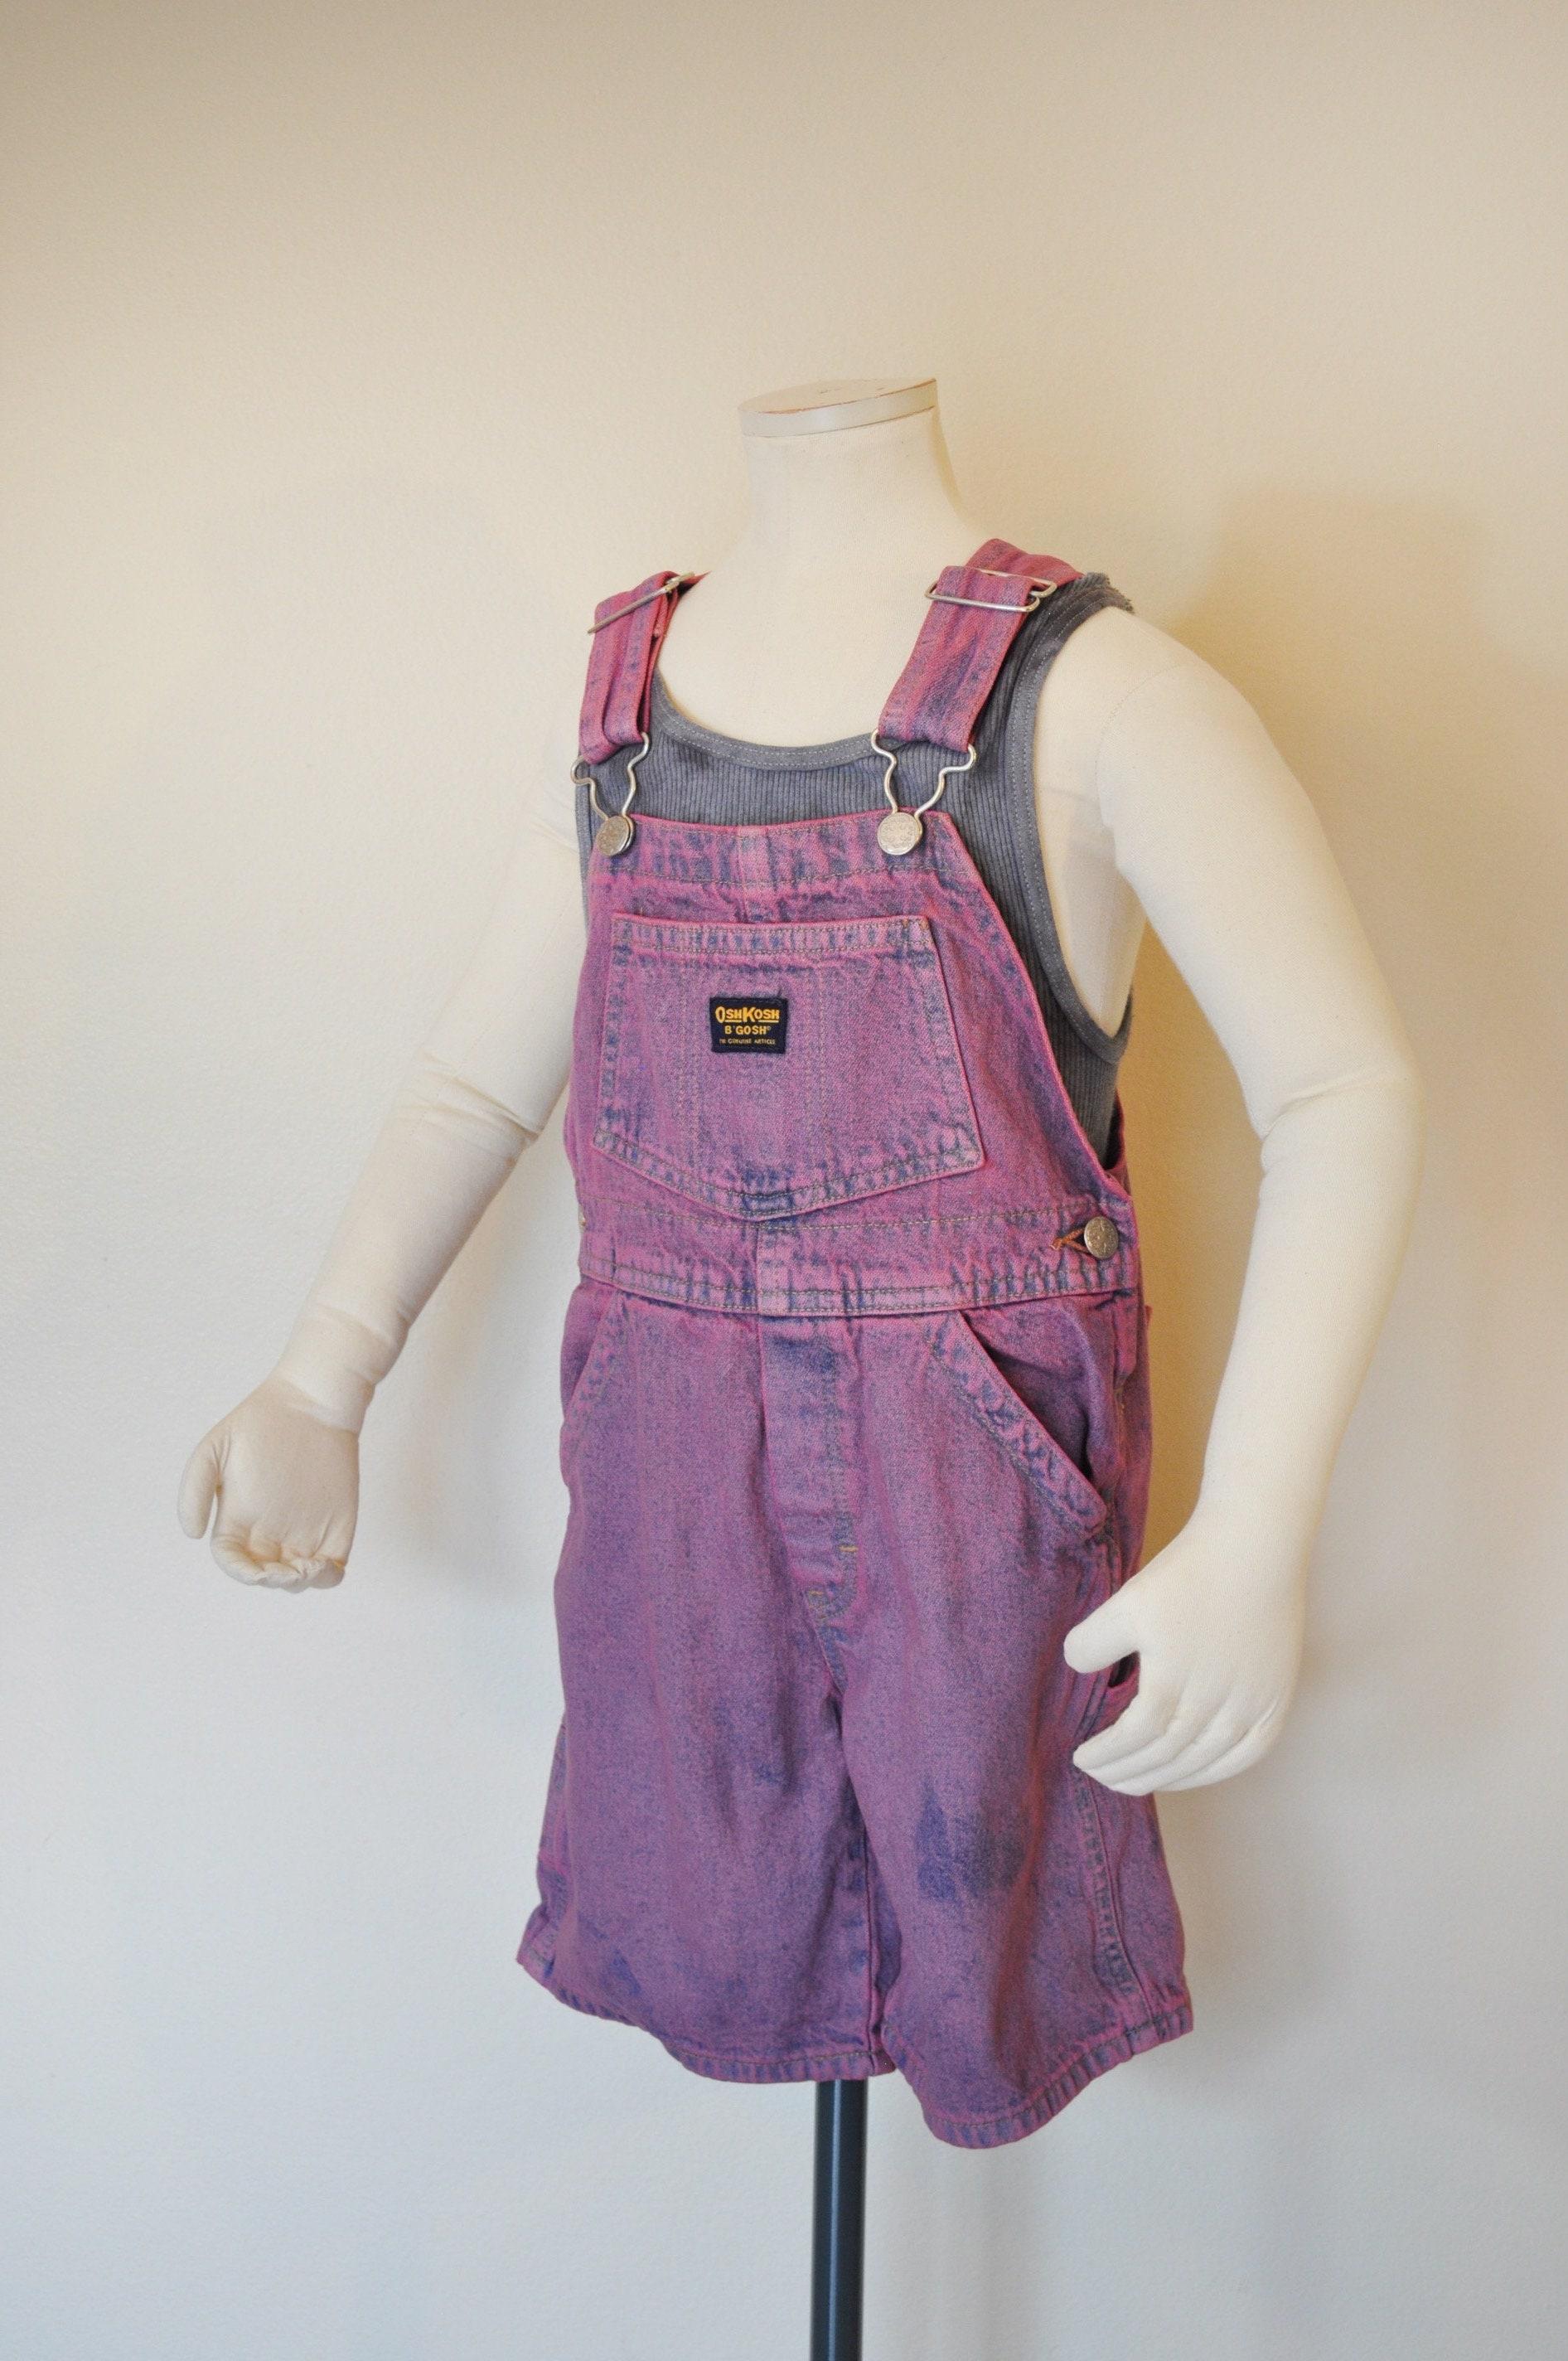 Vintage Overalls & Jumpsuits Mauve Pink Kid Sz 5 Year Bib Overall Shorts - Hand Dyed Vintage Oshkosh Denim Overall Child Girl Boy Size  28 Waist $25.00 AT vintagedancer.com